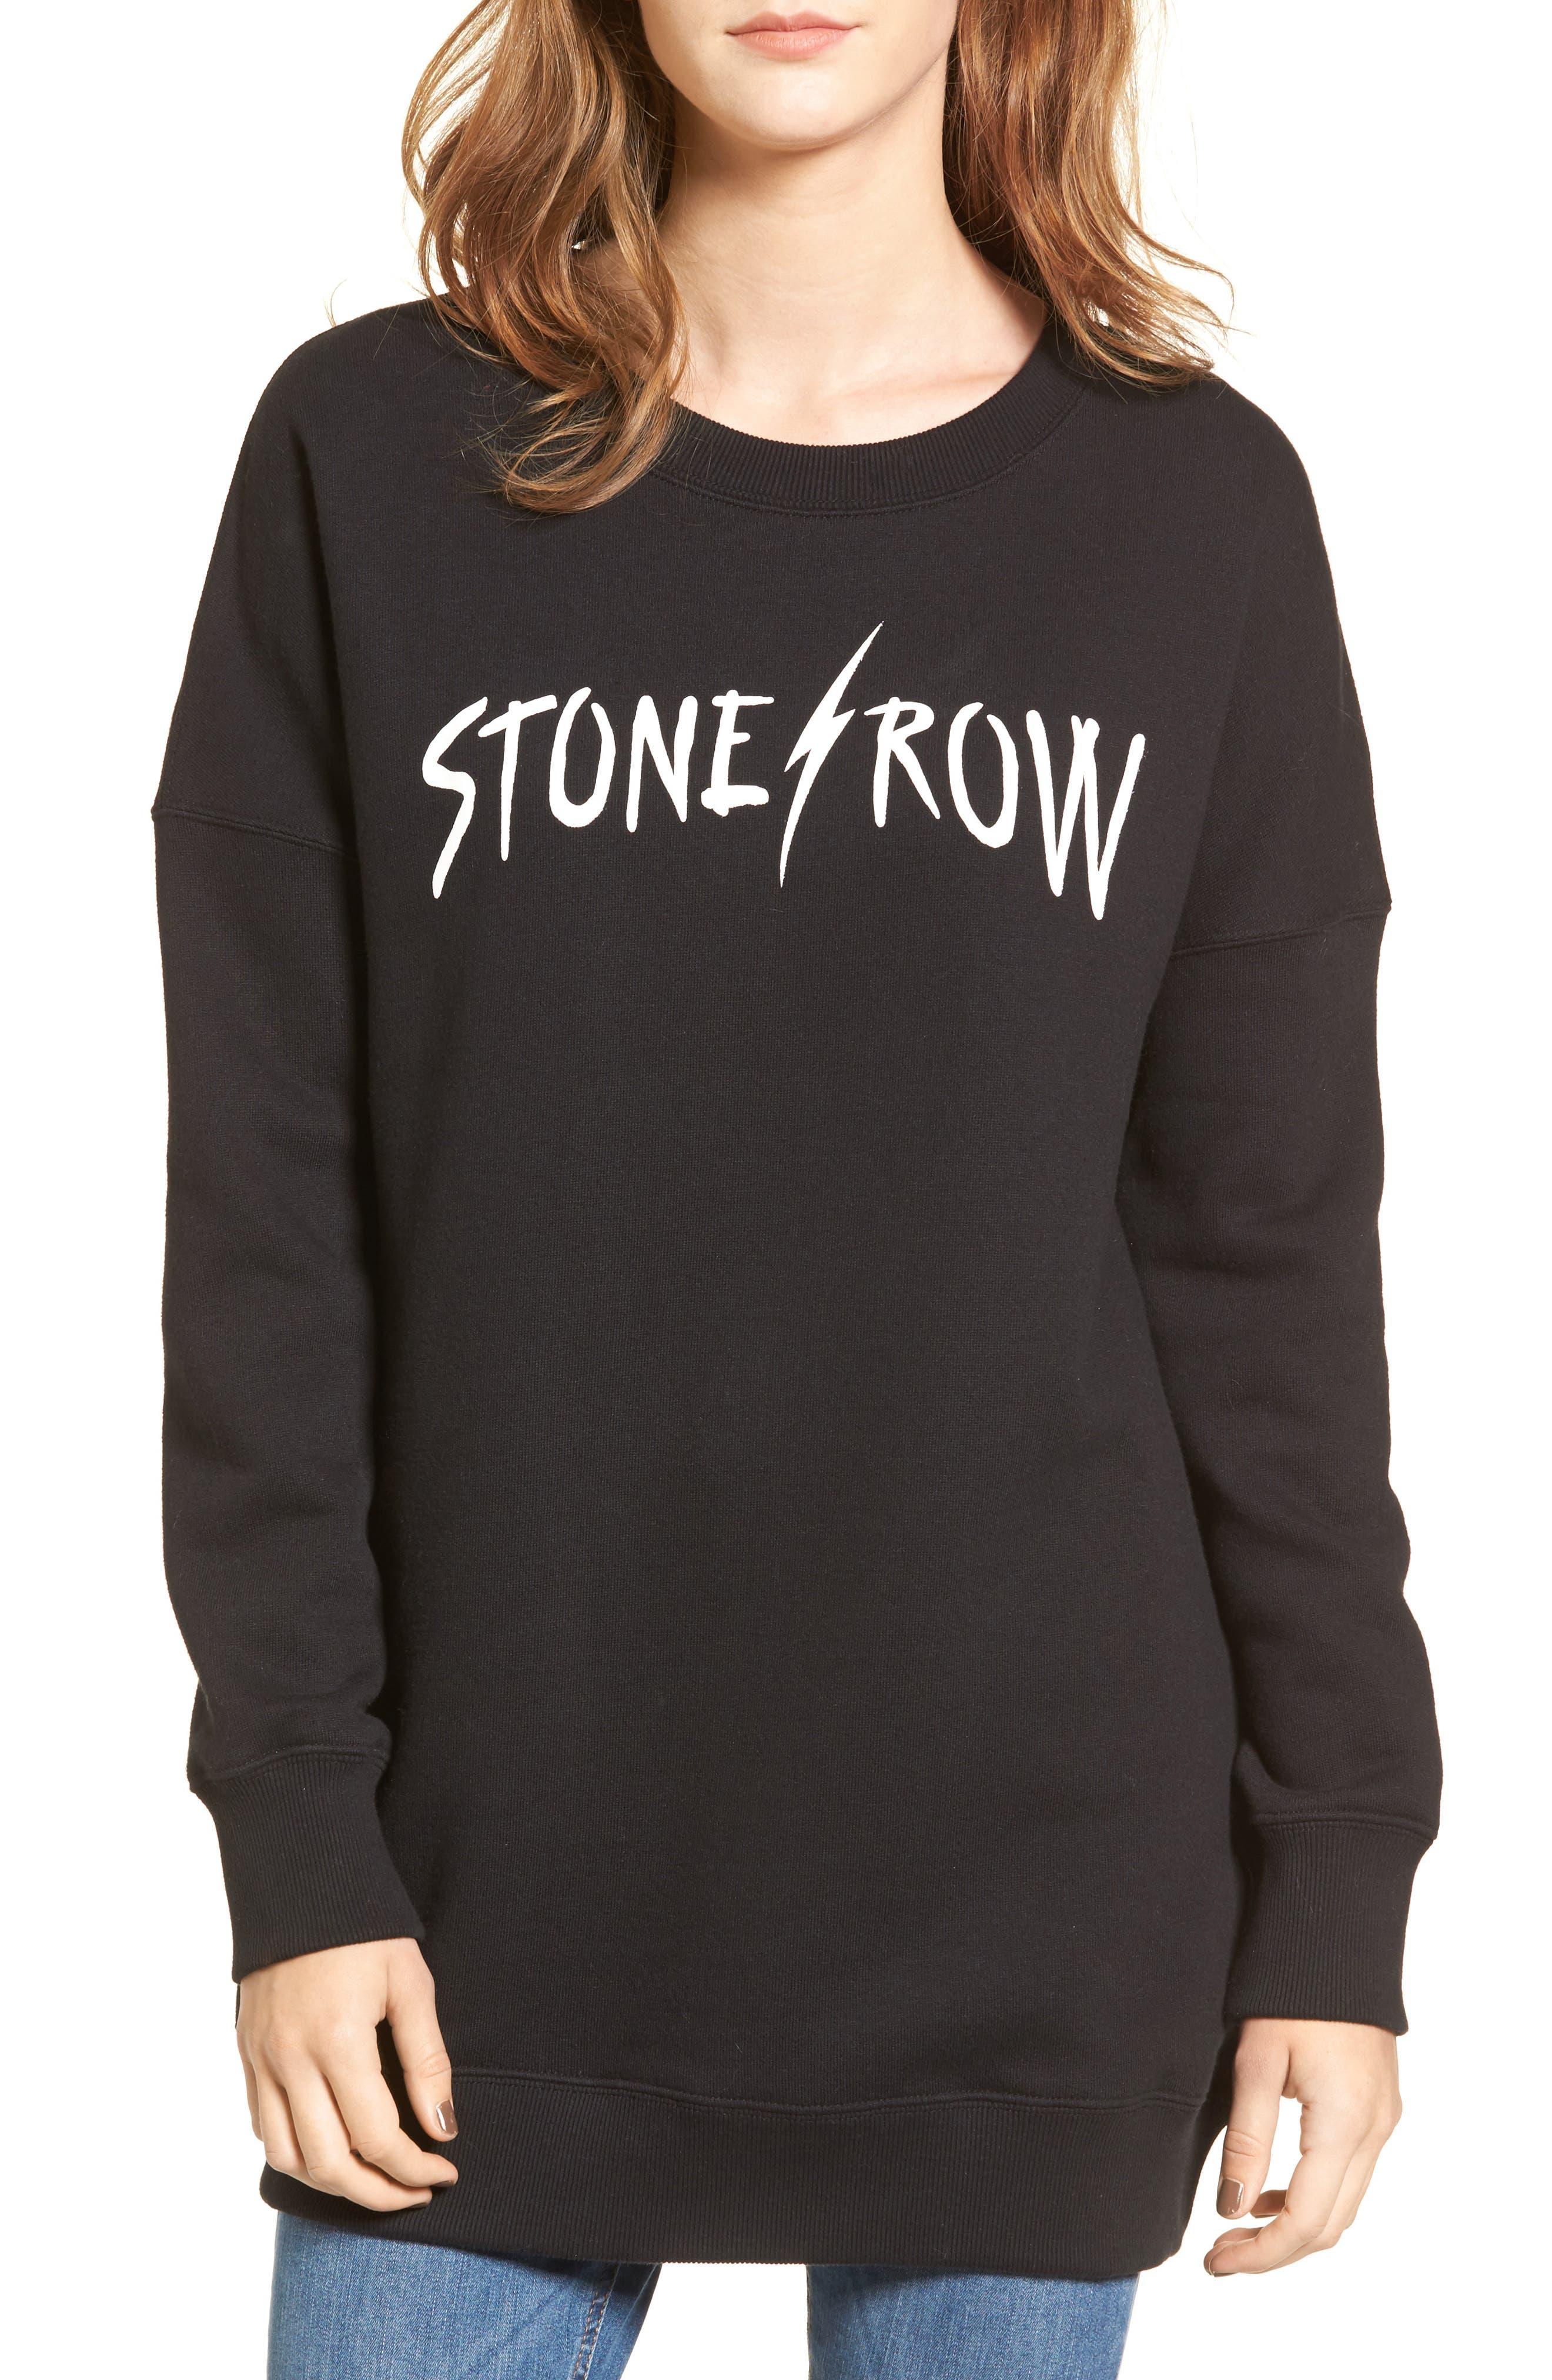 Me Too Sweatshirt,                         Main,                         color, 001